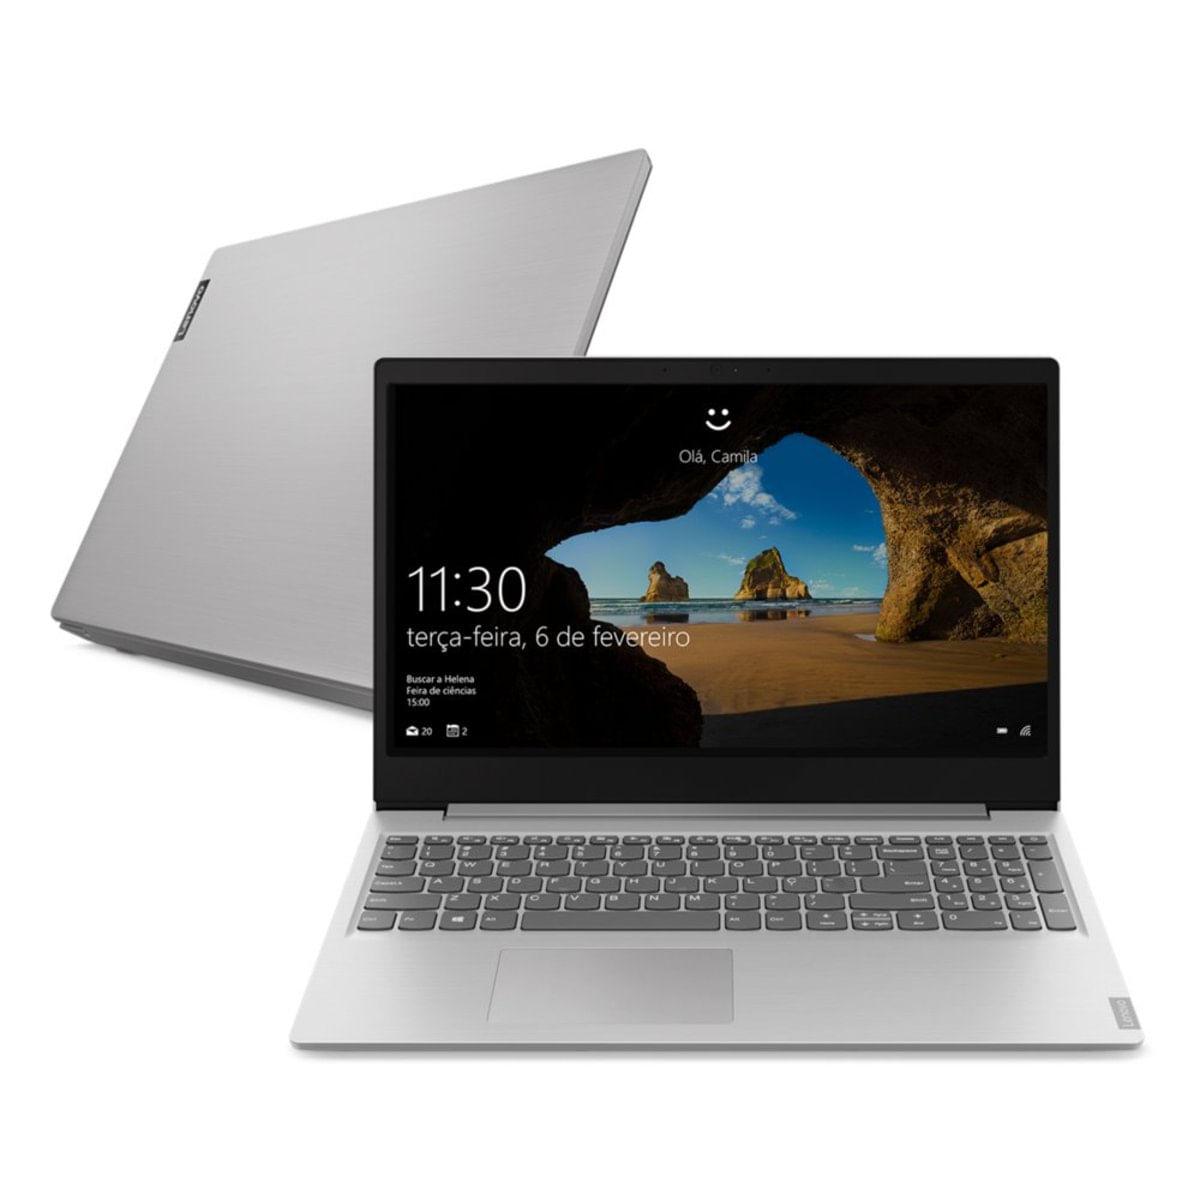 Imagem de Notebook Lenovo Ideapad S145 i7-1065G7 8GB SSD 256GB Iris Plus Graphics Tela 15,6